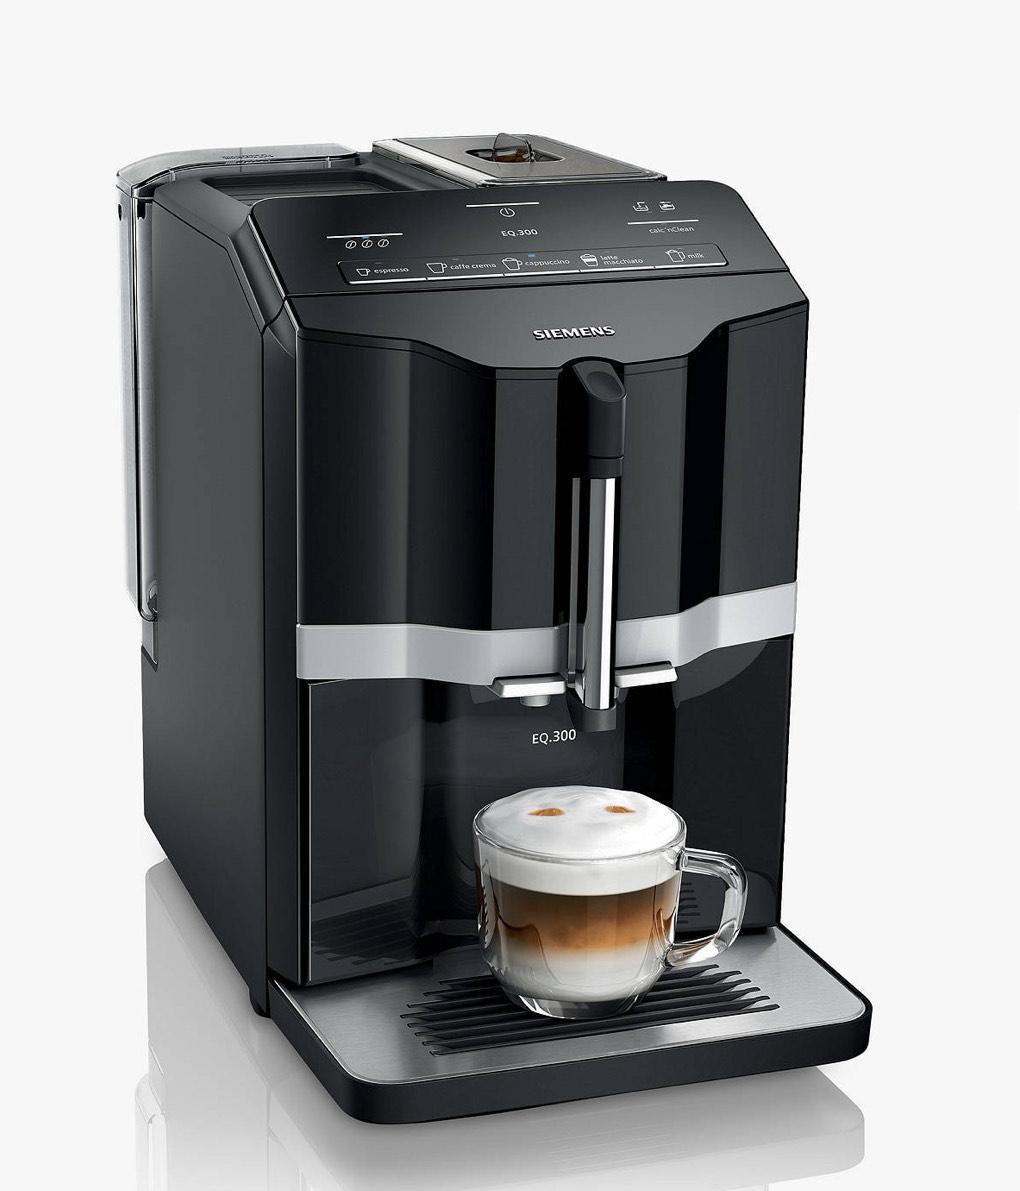 Siemens EQ3 Espresso Coffee Machine now £349.99 (£299.99 after cashback) at John Lewis & Partners